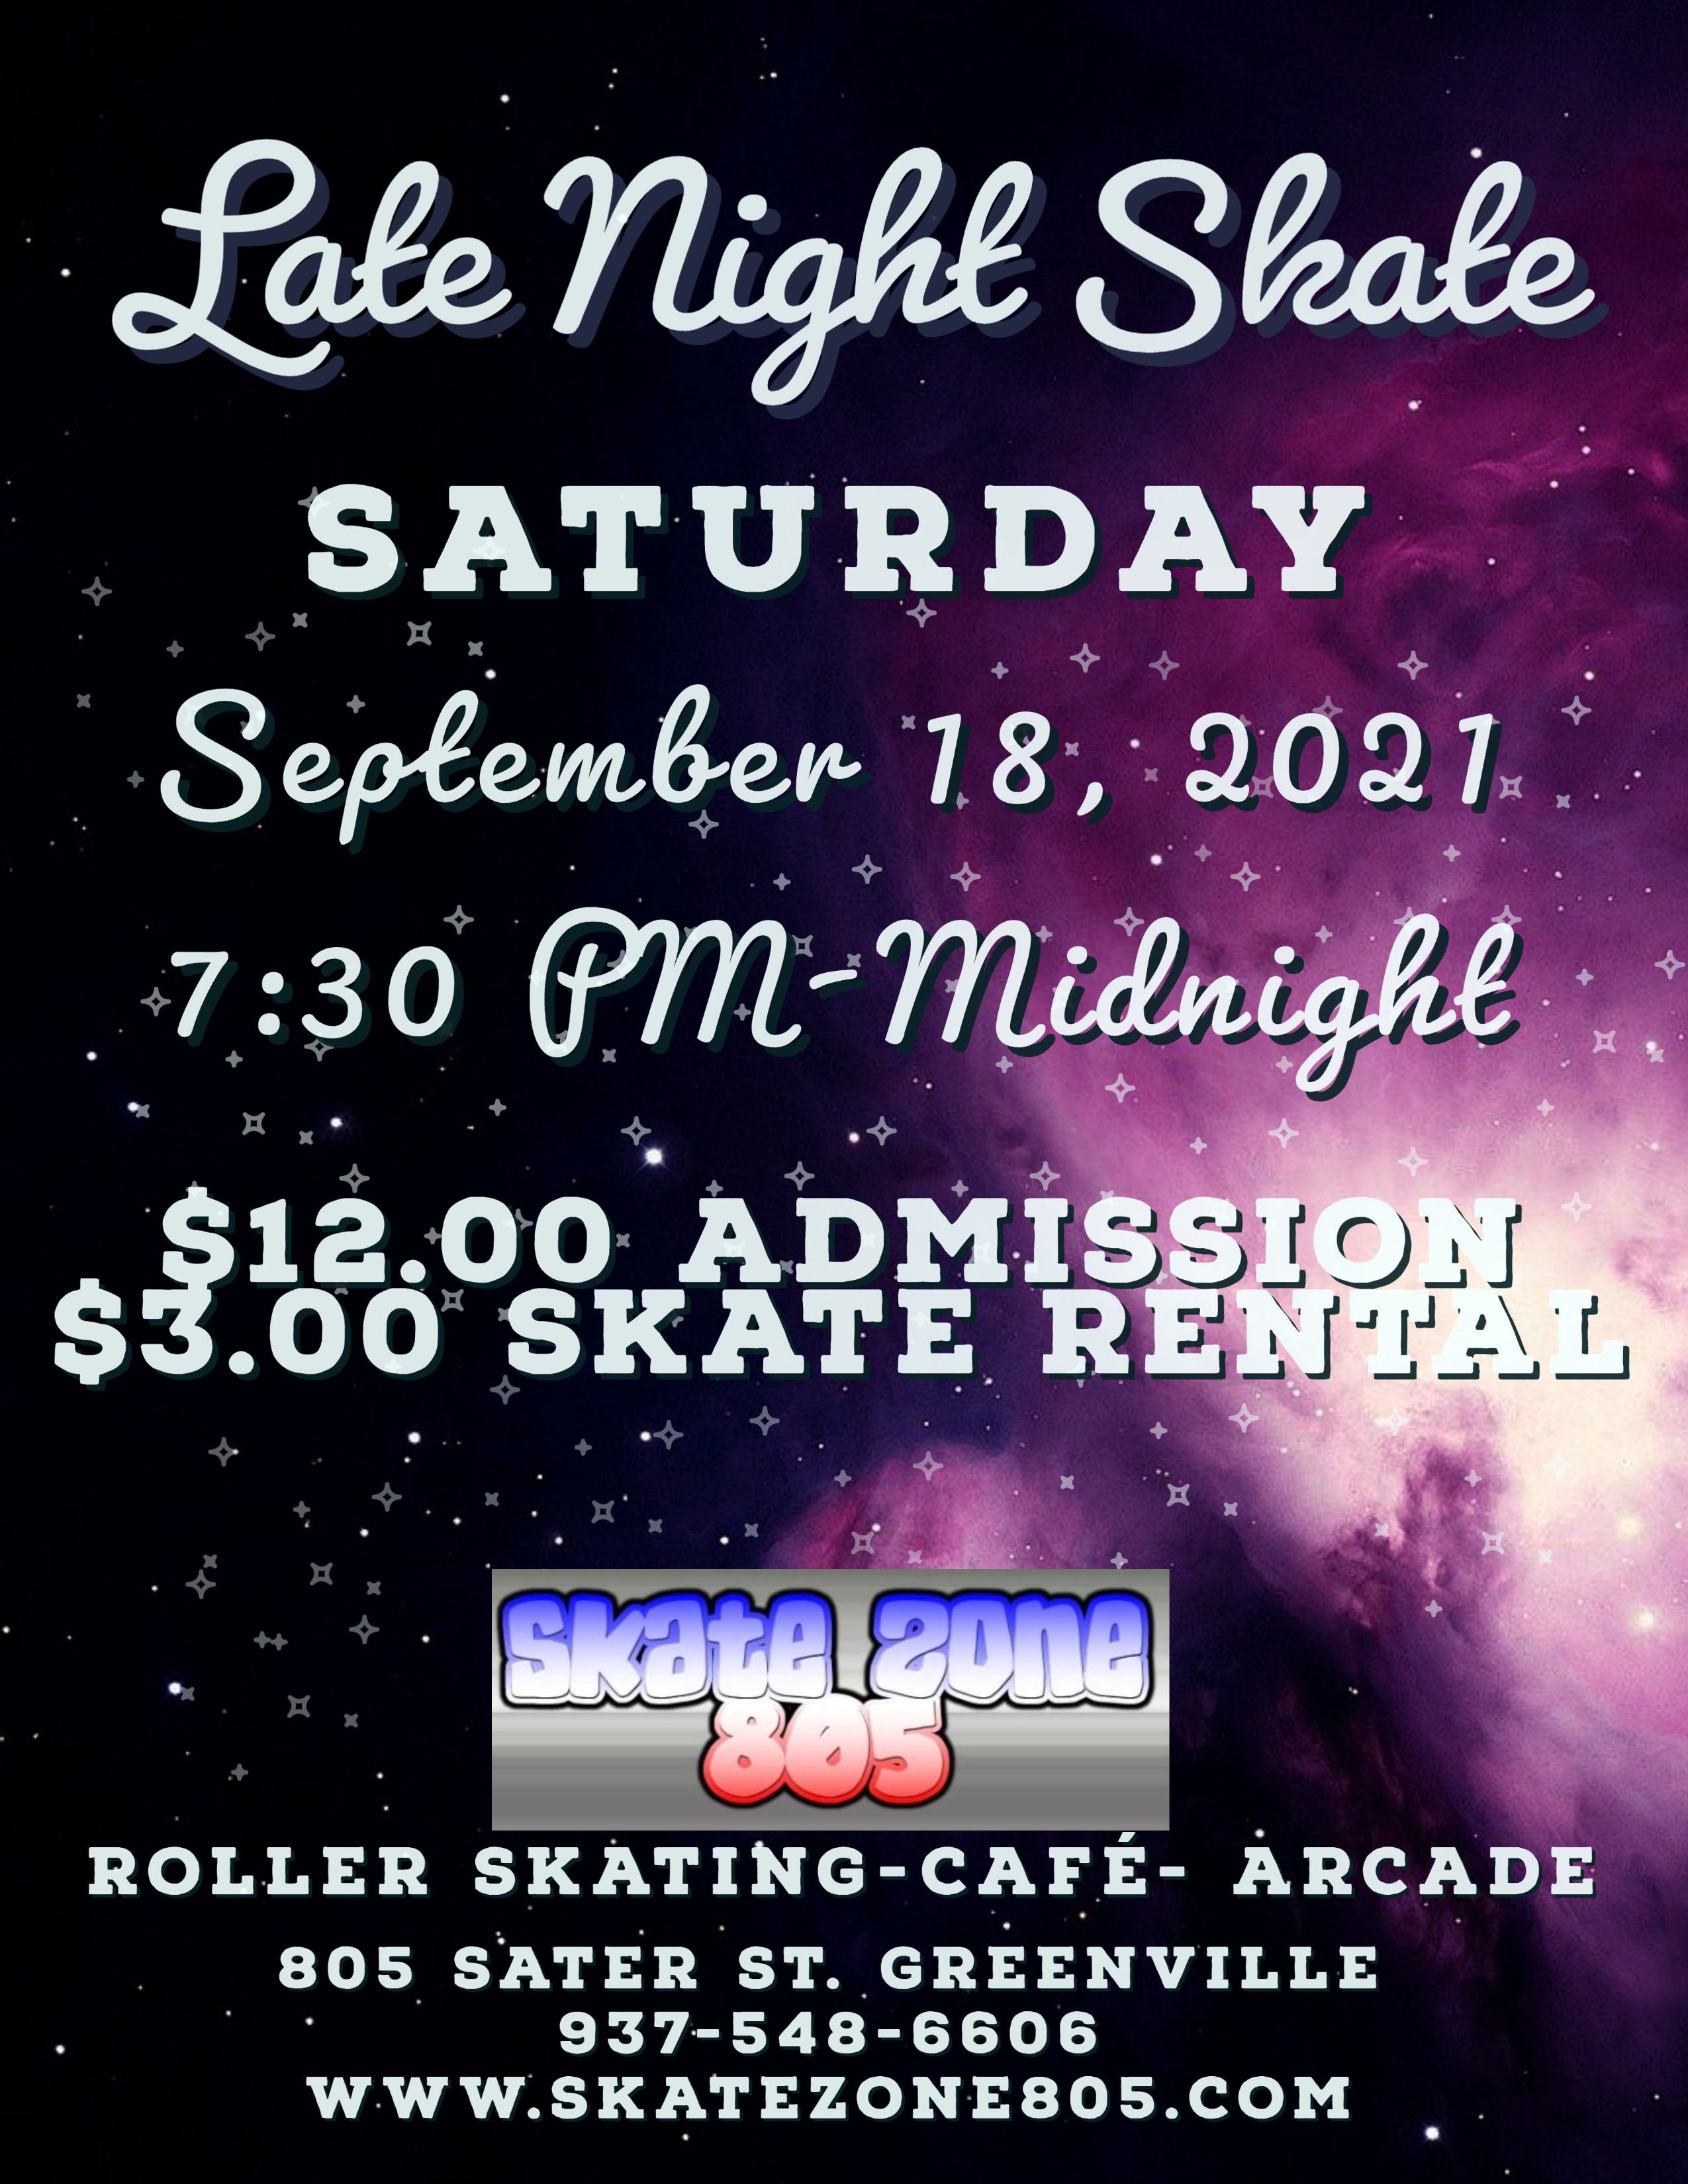 Late Night Skate